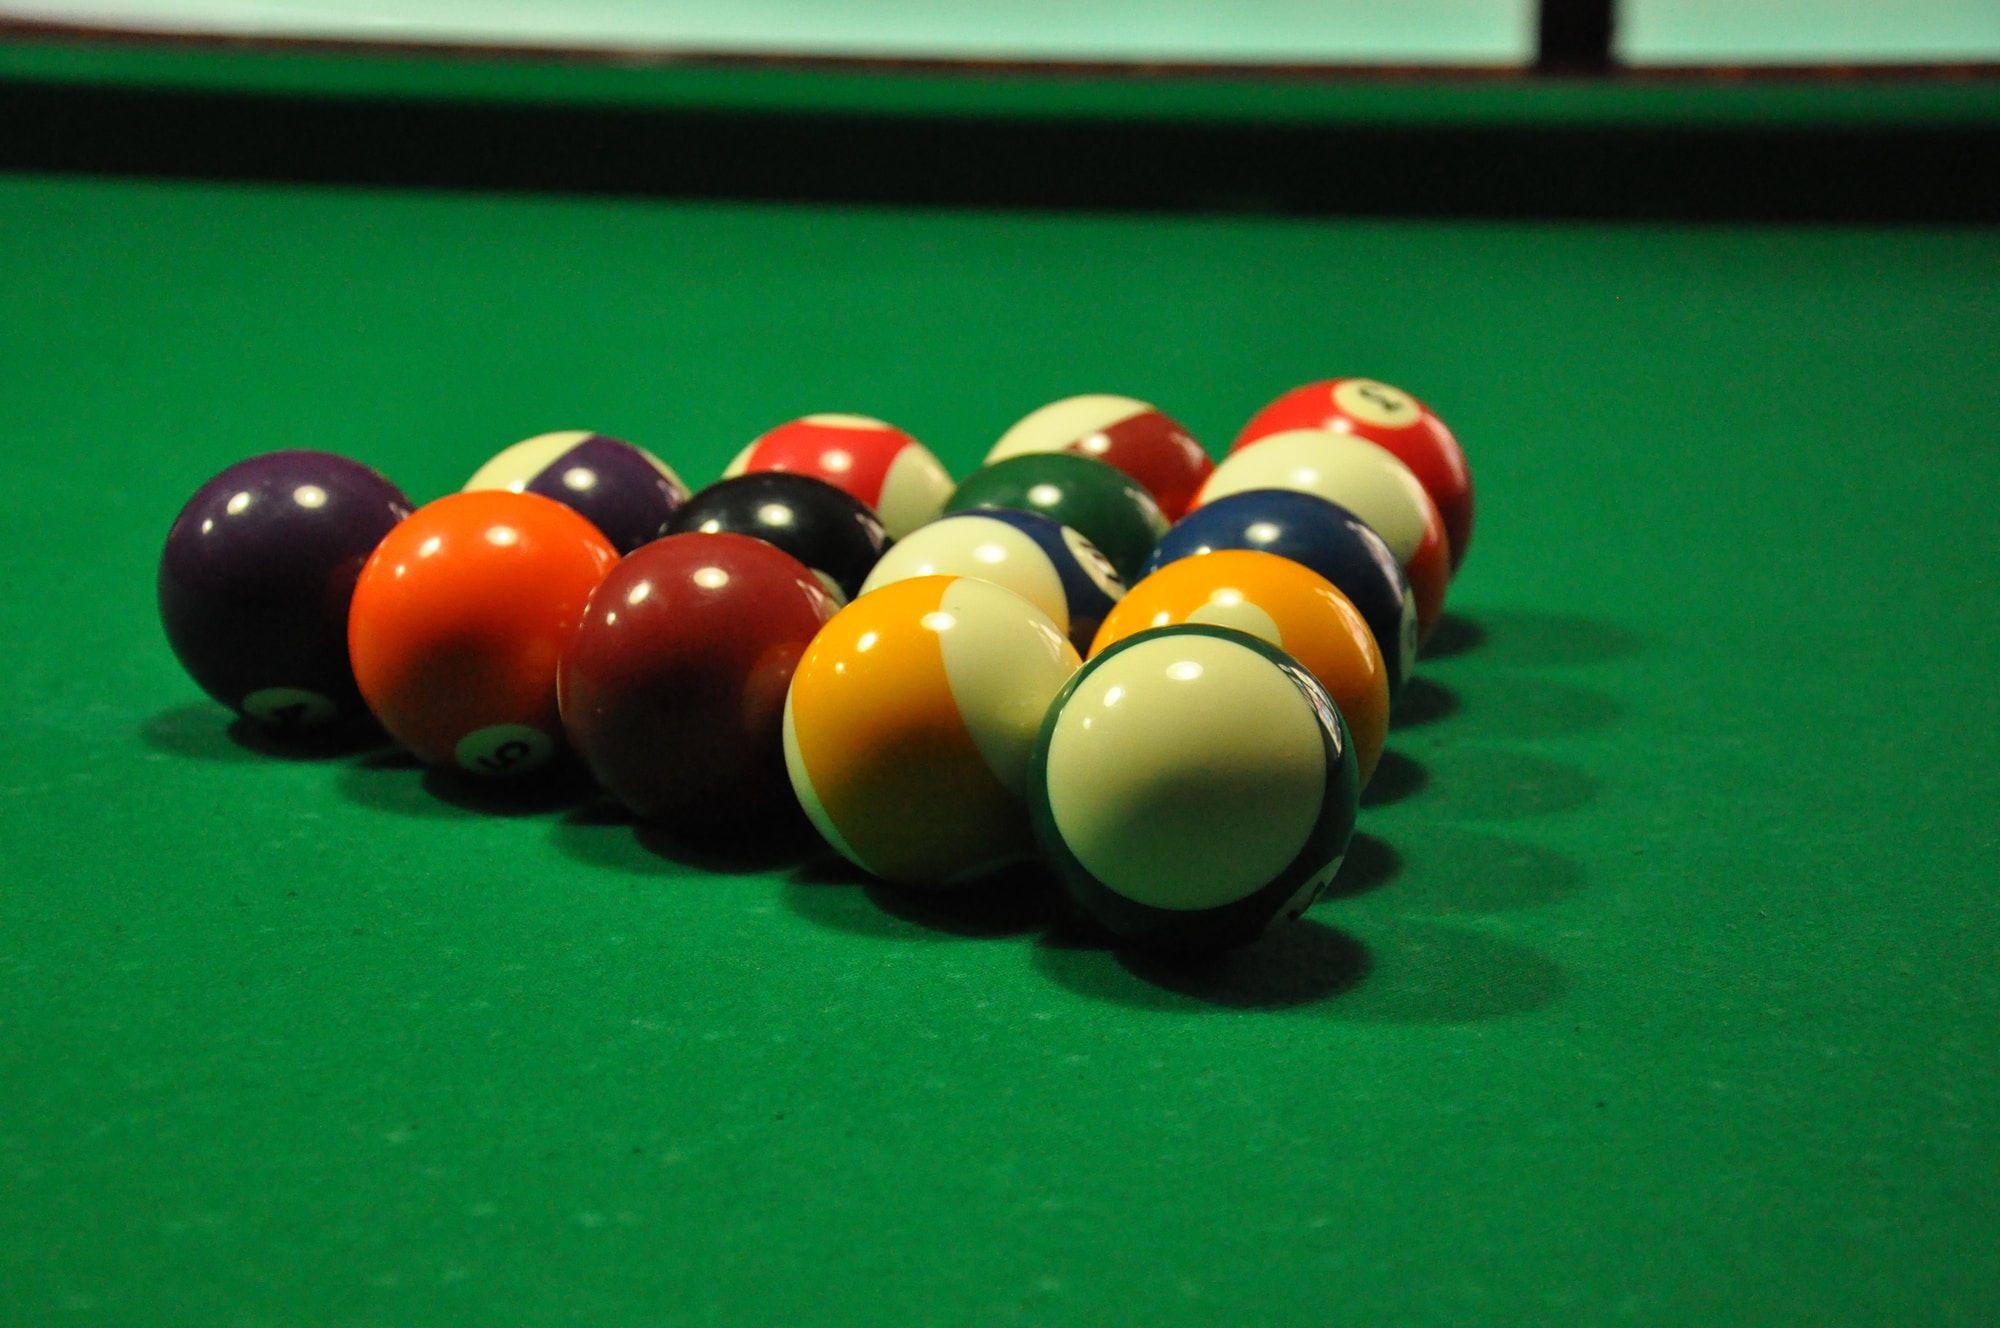 Hotshots American Pool, Big Screen Sports and Drinks at Butlins